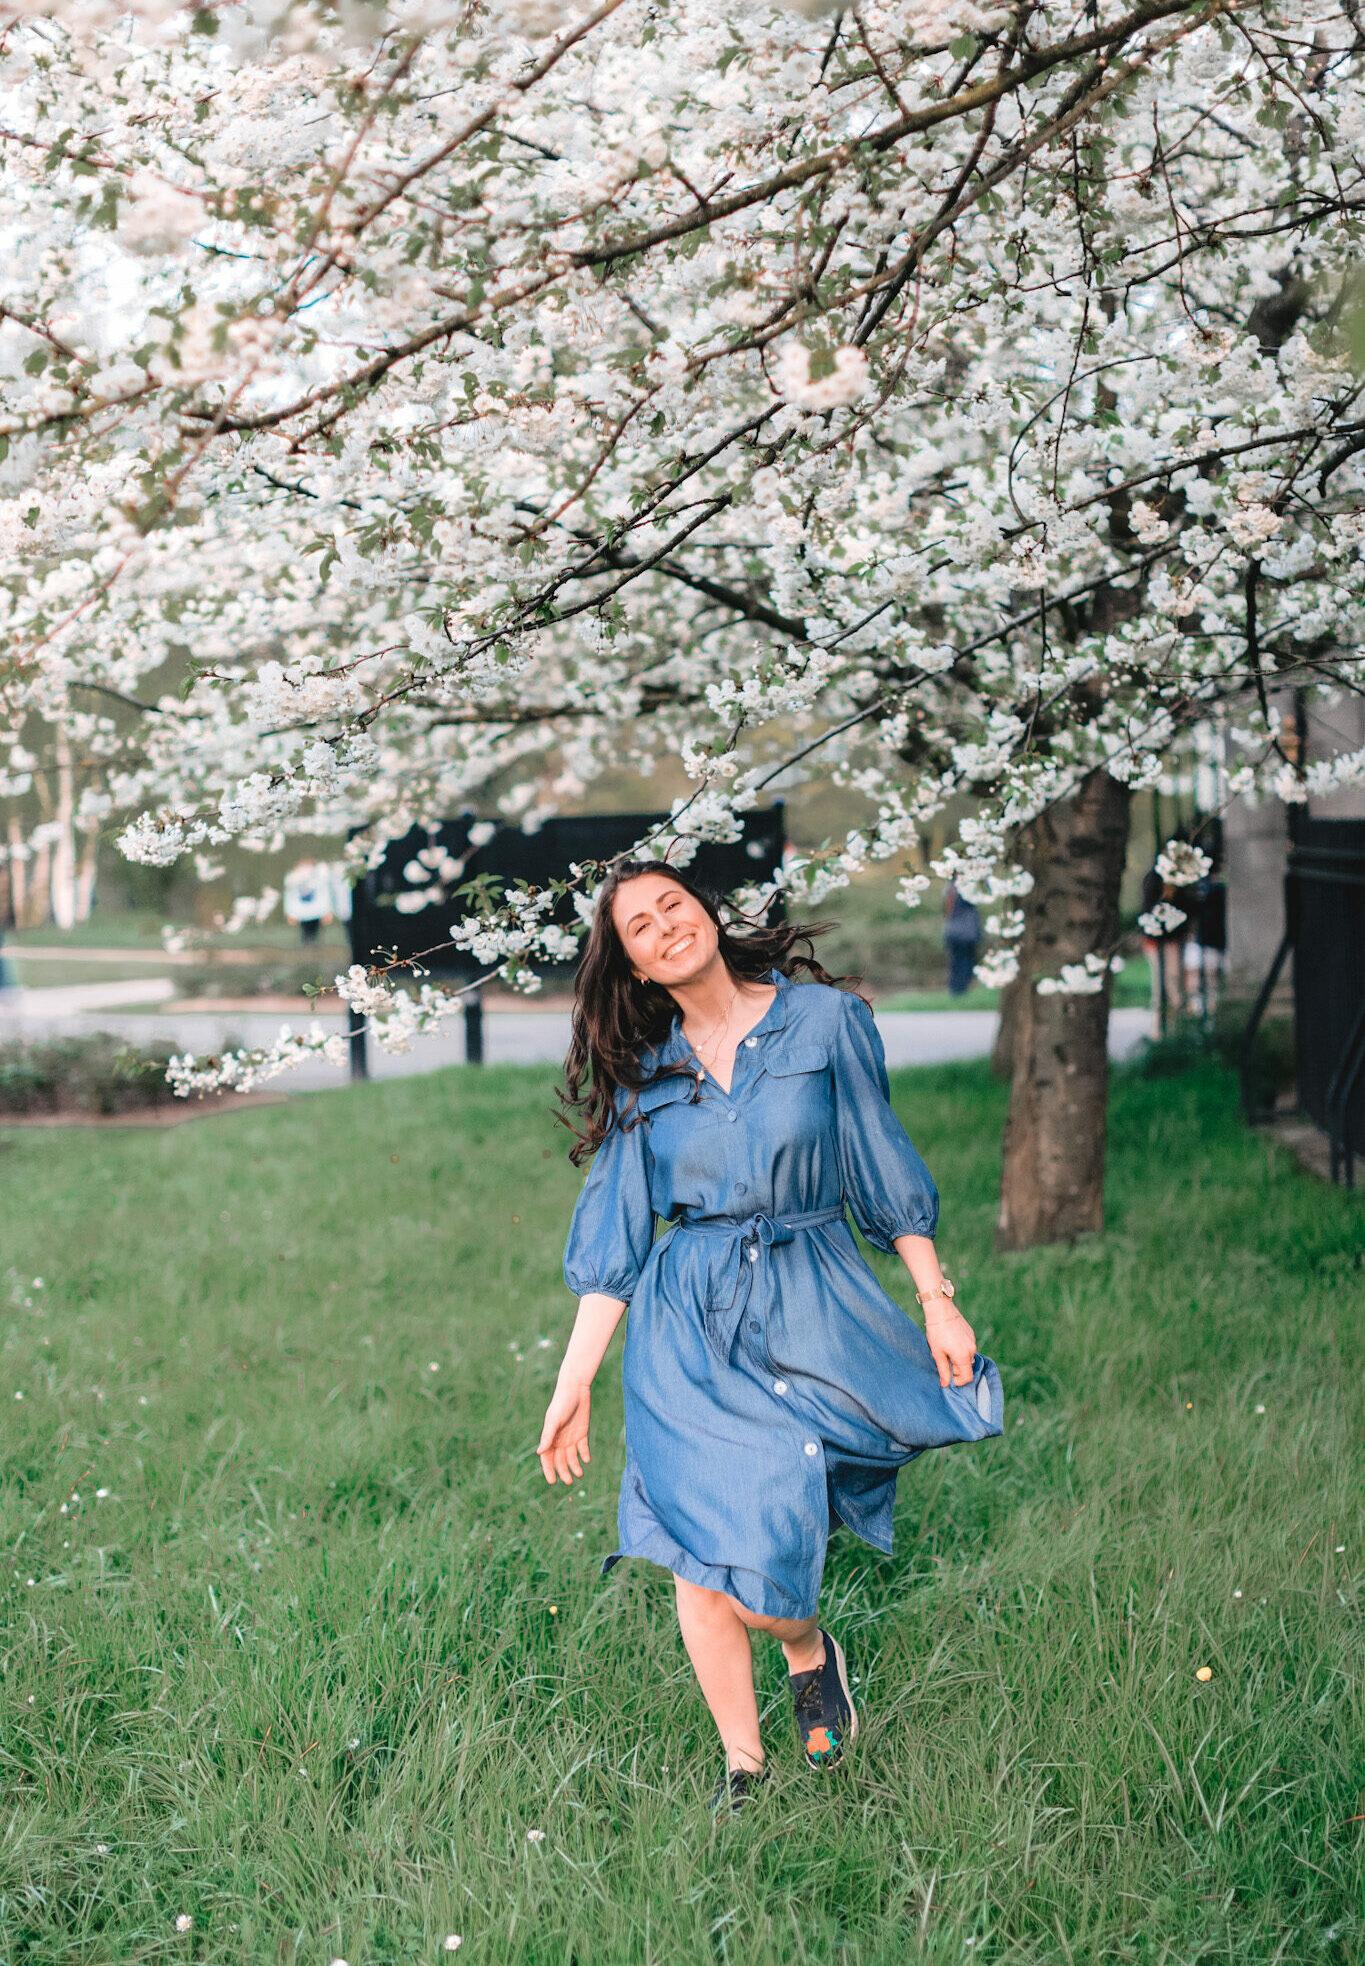 66-Andrea-Prodan-Coaching_Branding-and-Lifestyle-Photo-Session_London_2019_Joana-Senkute-Photography-e1626194855281 HOME